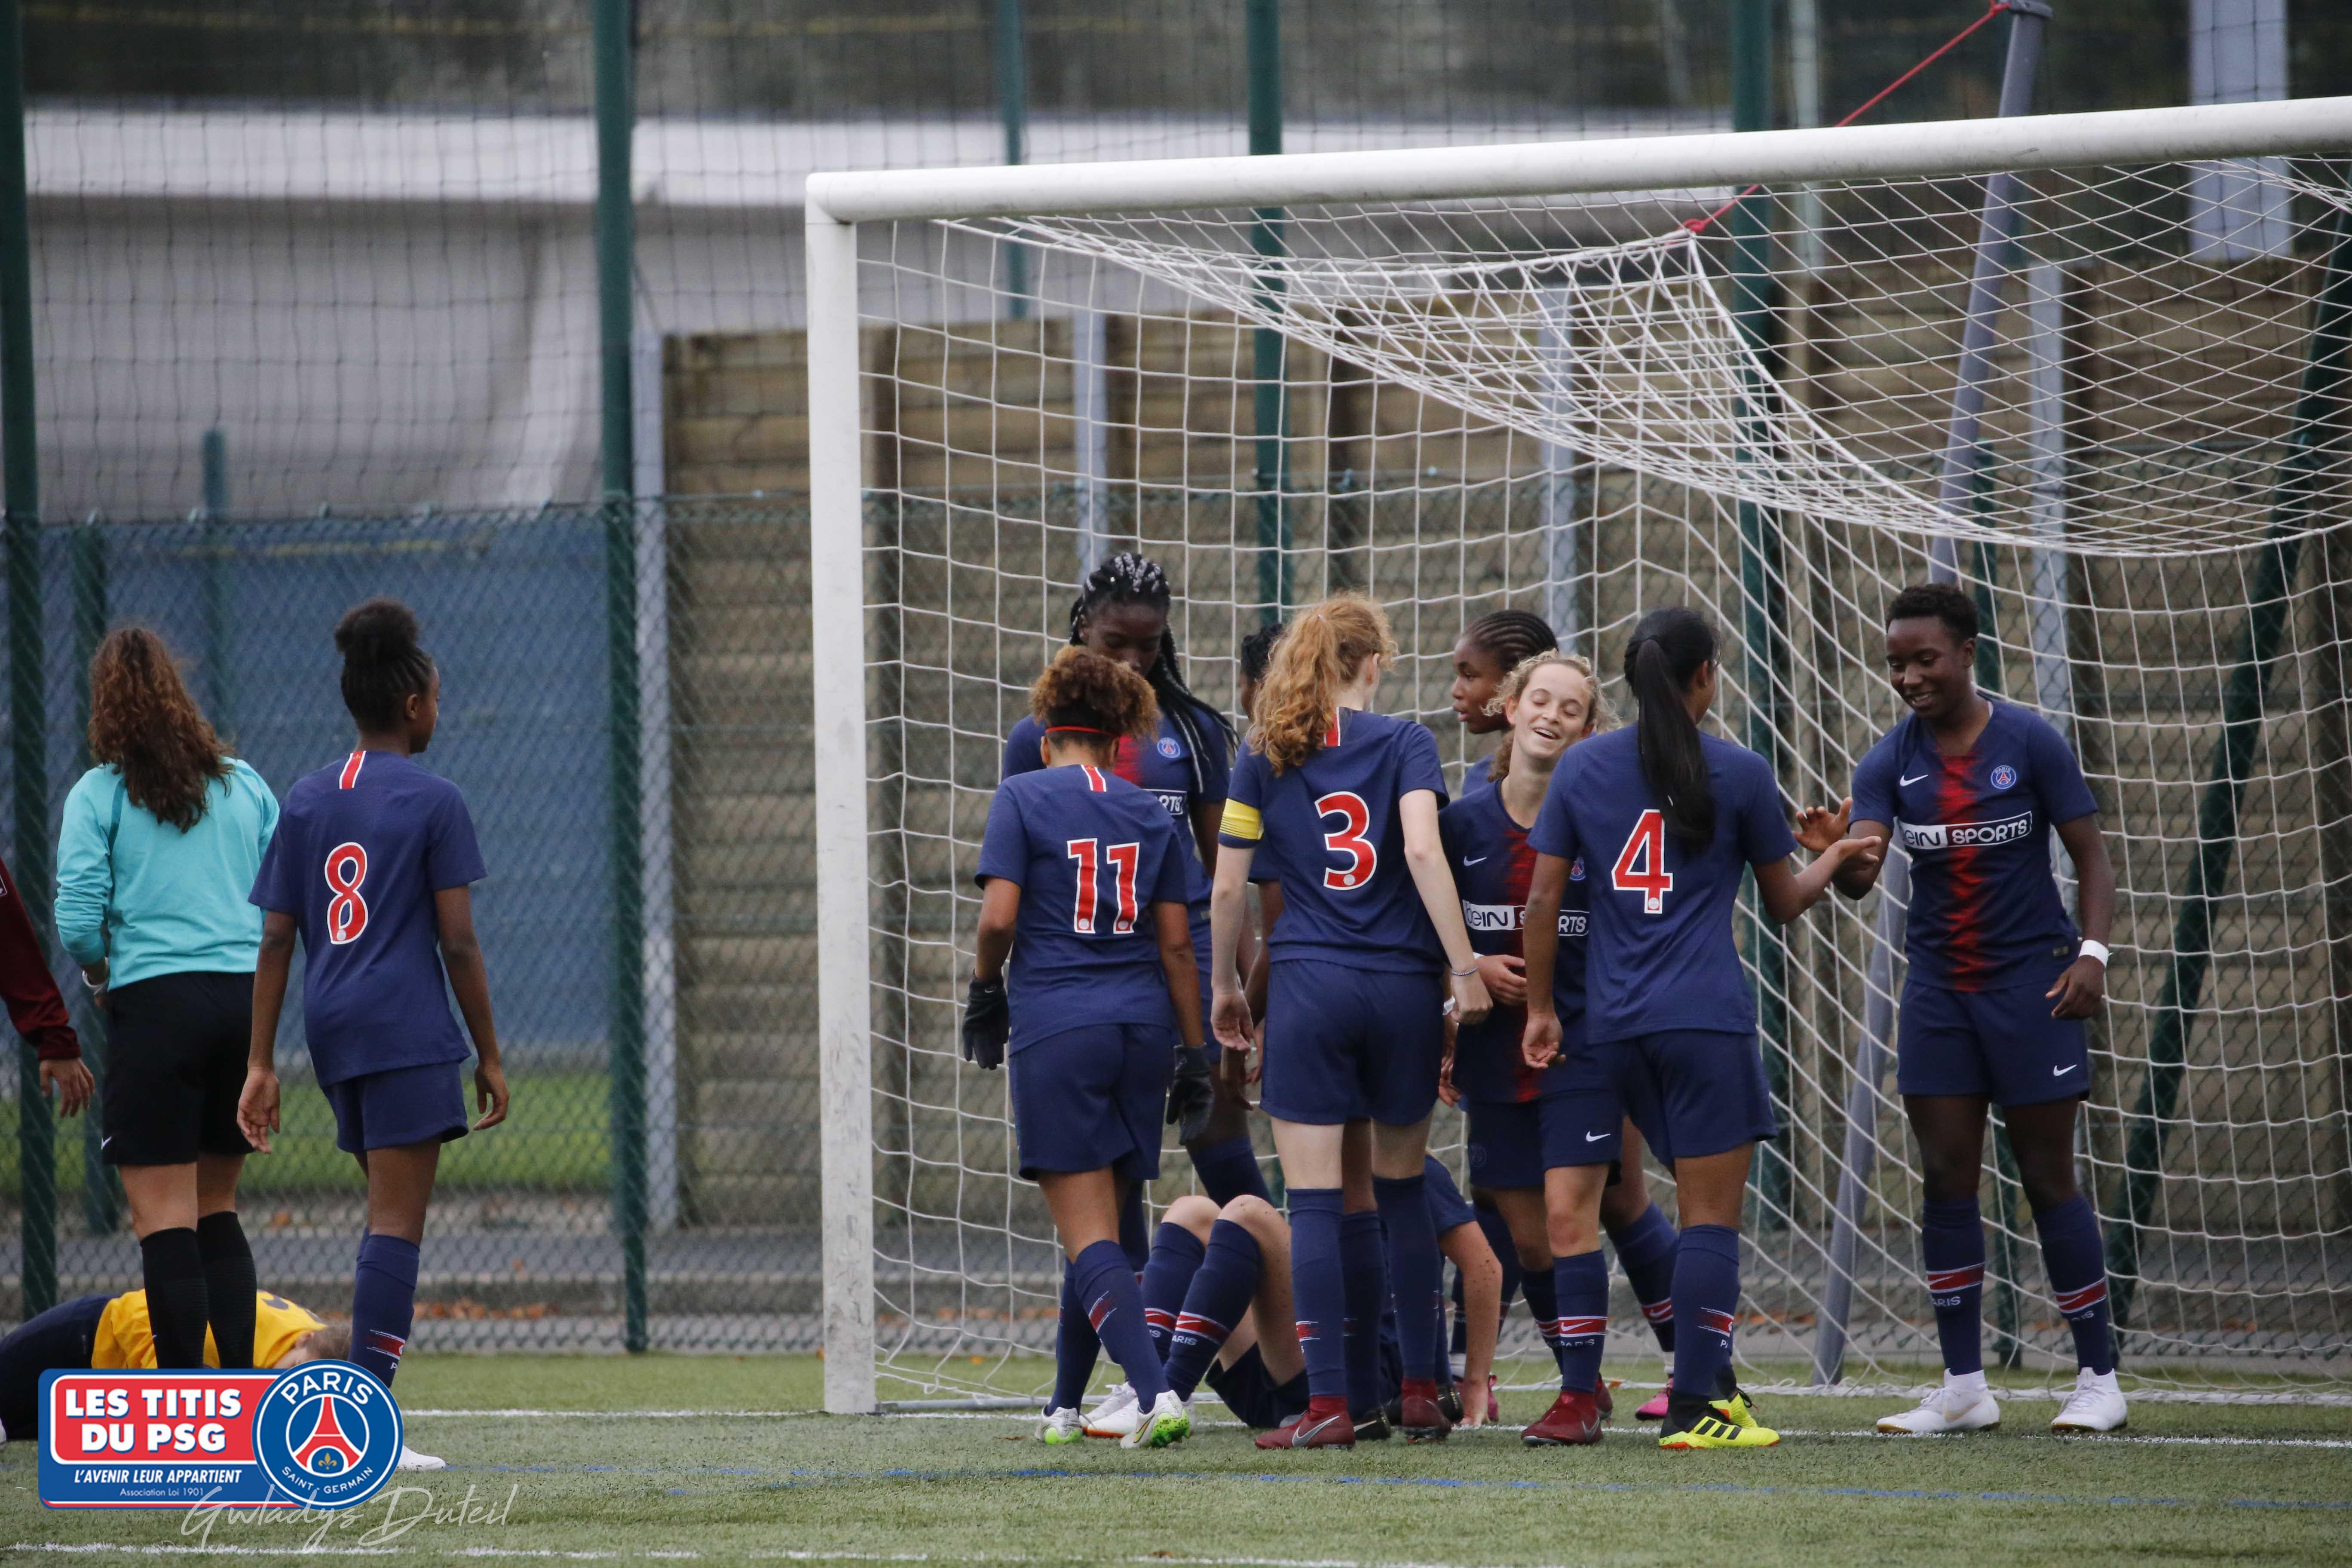 MATCH U19 FÉMININES PSG/FC METZ LE 07/10/2019